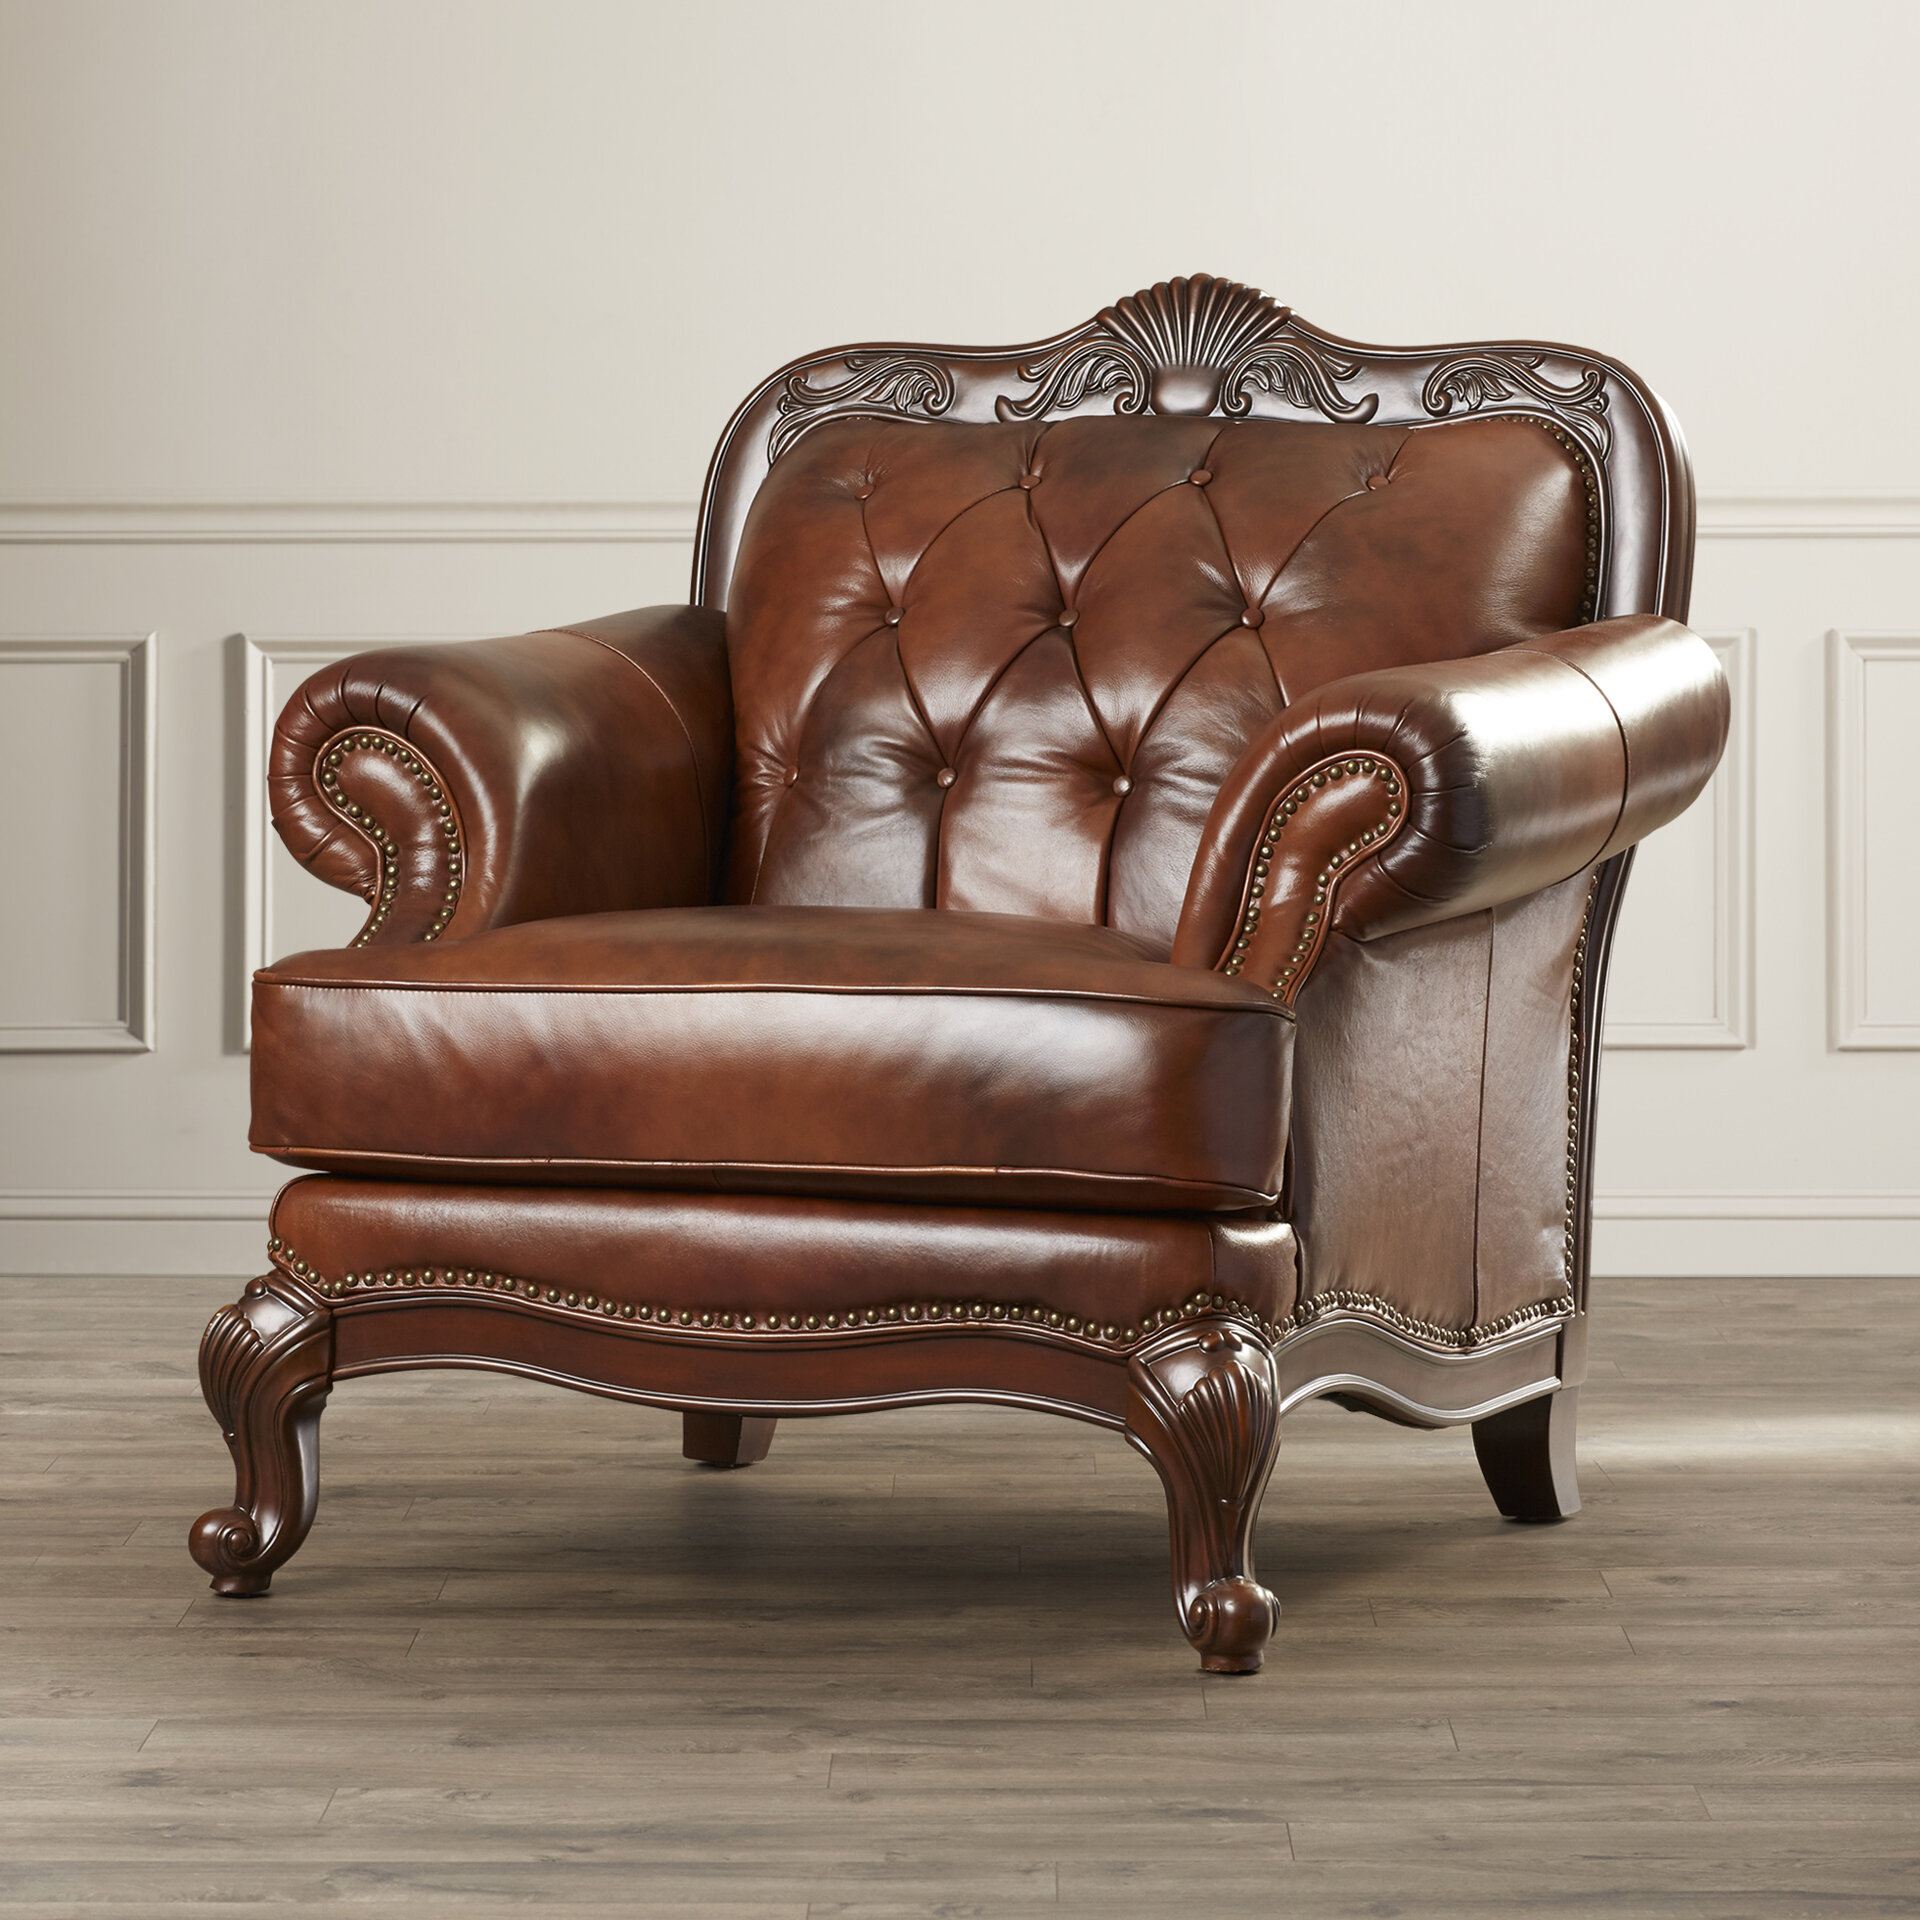 Admirable Darby Home Co Smith Club Chair Reviews Wayfair Bralicious Painted Fabric Chair Ideas Braliciousco